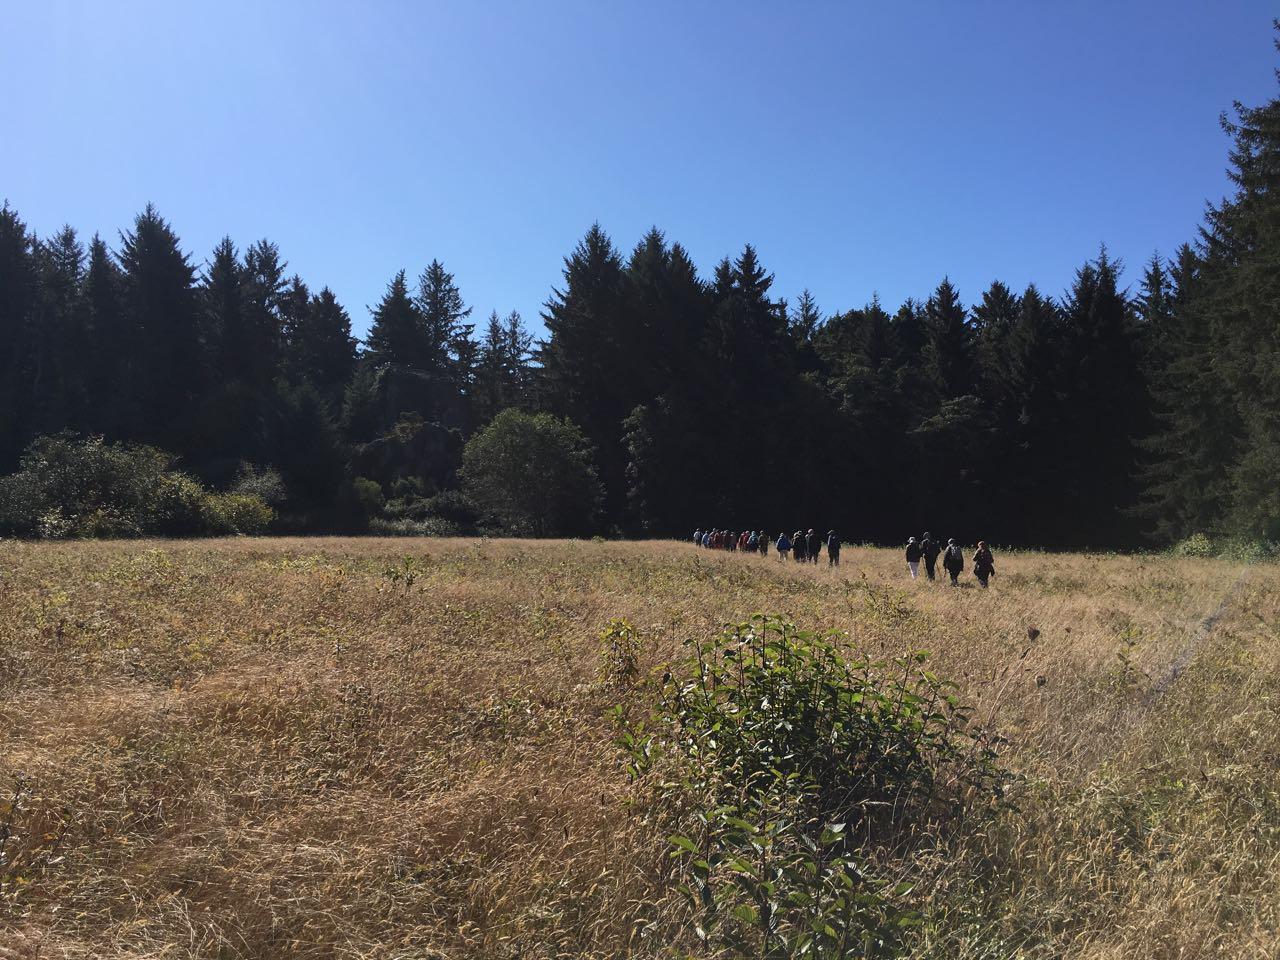 Redwoods 2017 10 01 114 Of 244